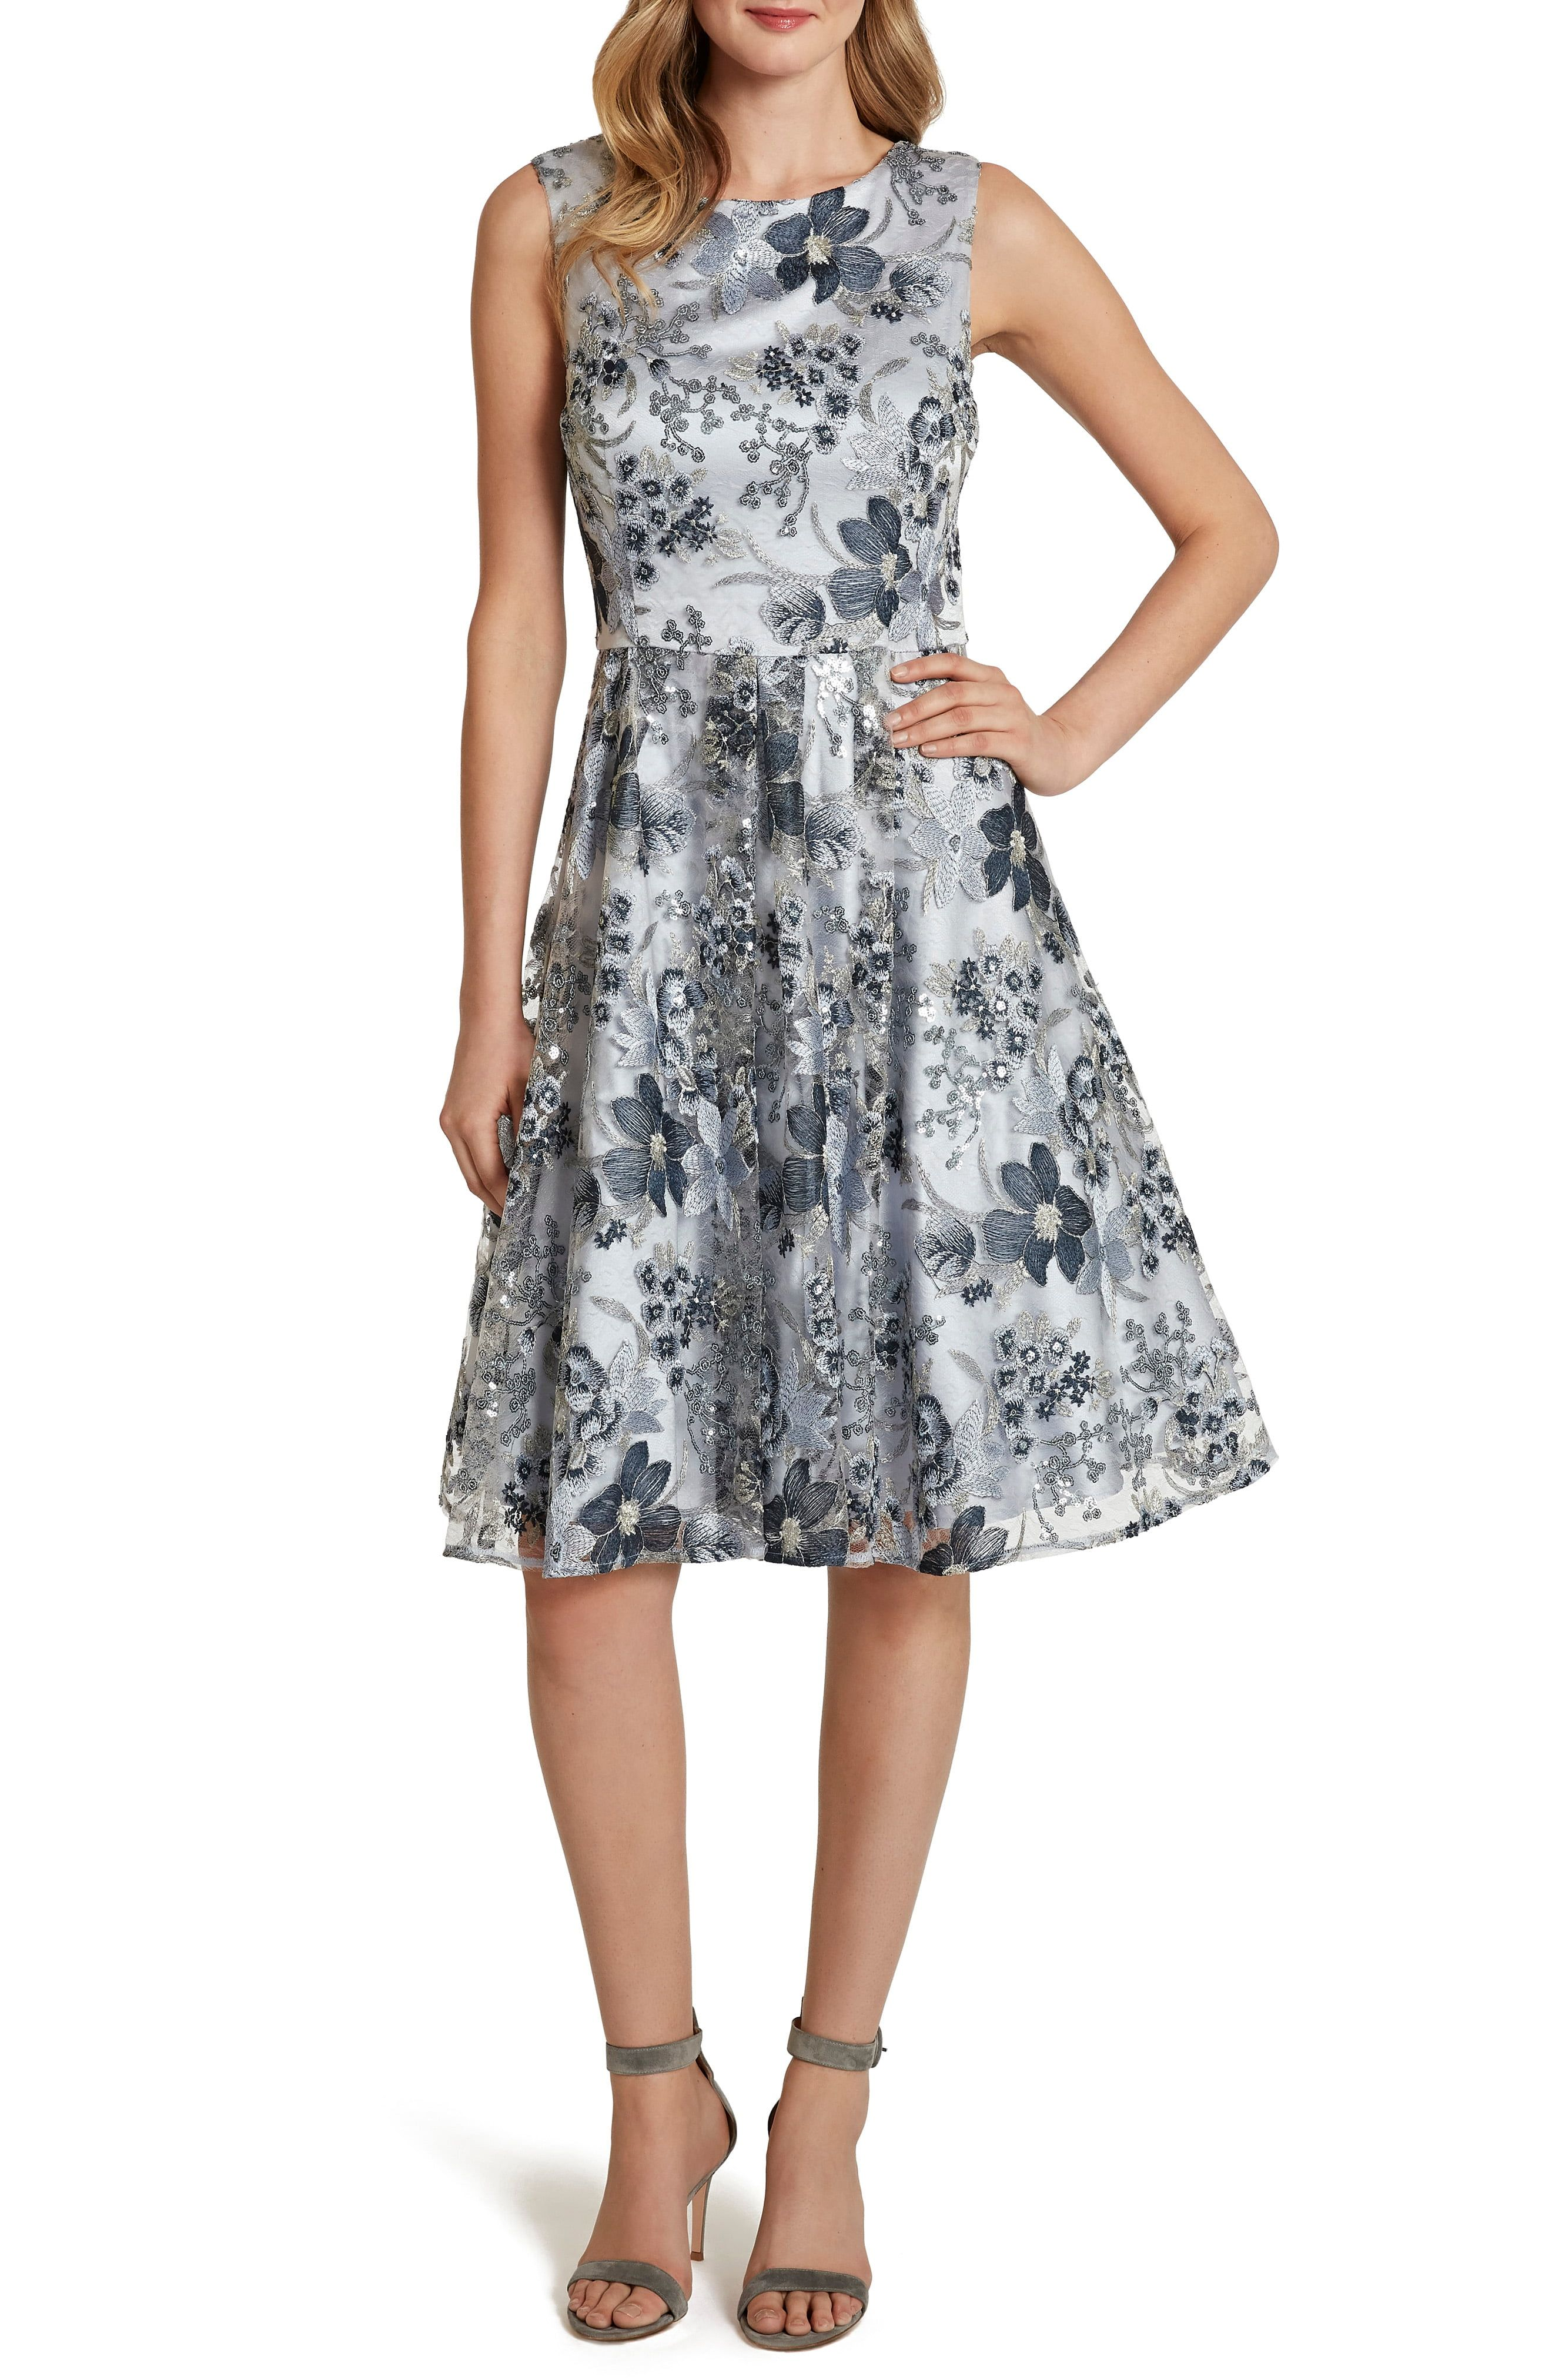 Tahari Sleeveless Embroidered Fit Flare Cocktail Dress Nordstrom Fit And Flare Cocktail Dress Cocktail Dress Dresses [ 4048 x 2640 Pixel ]